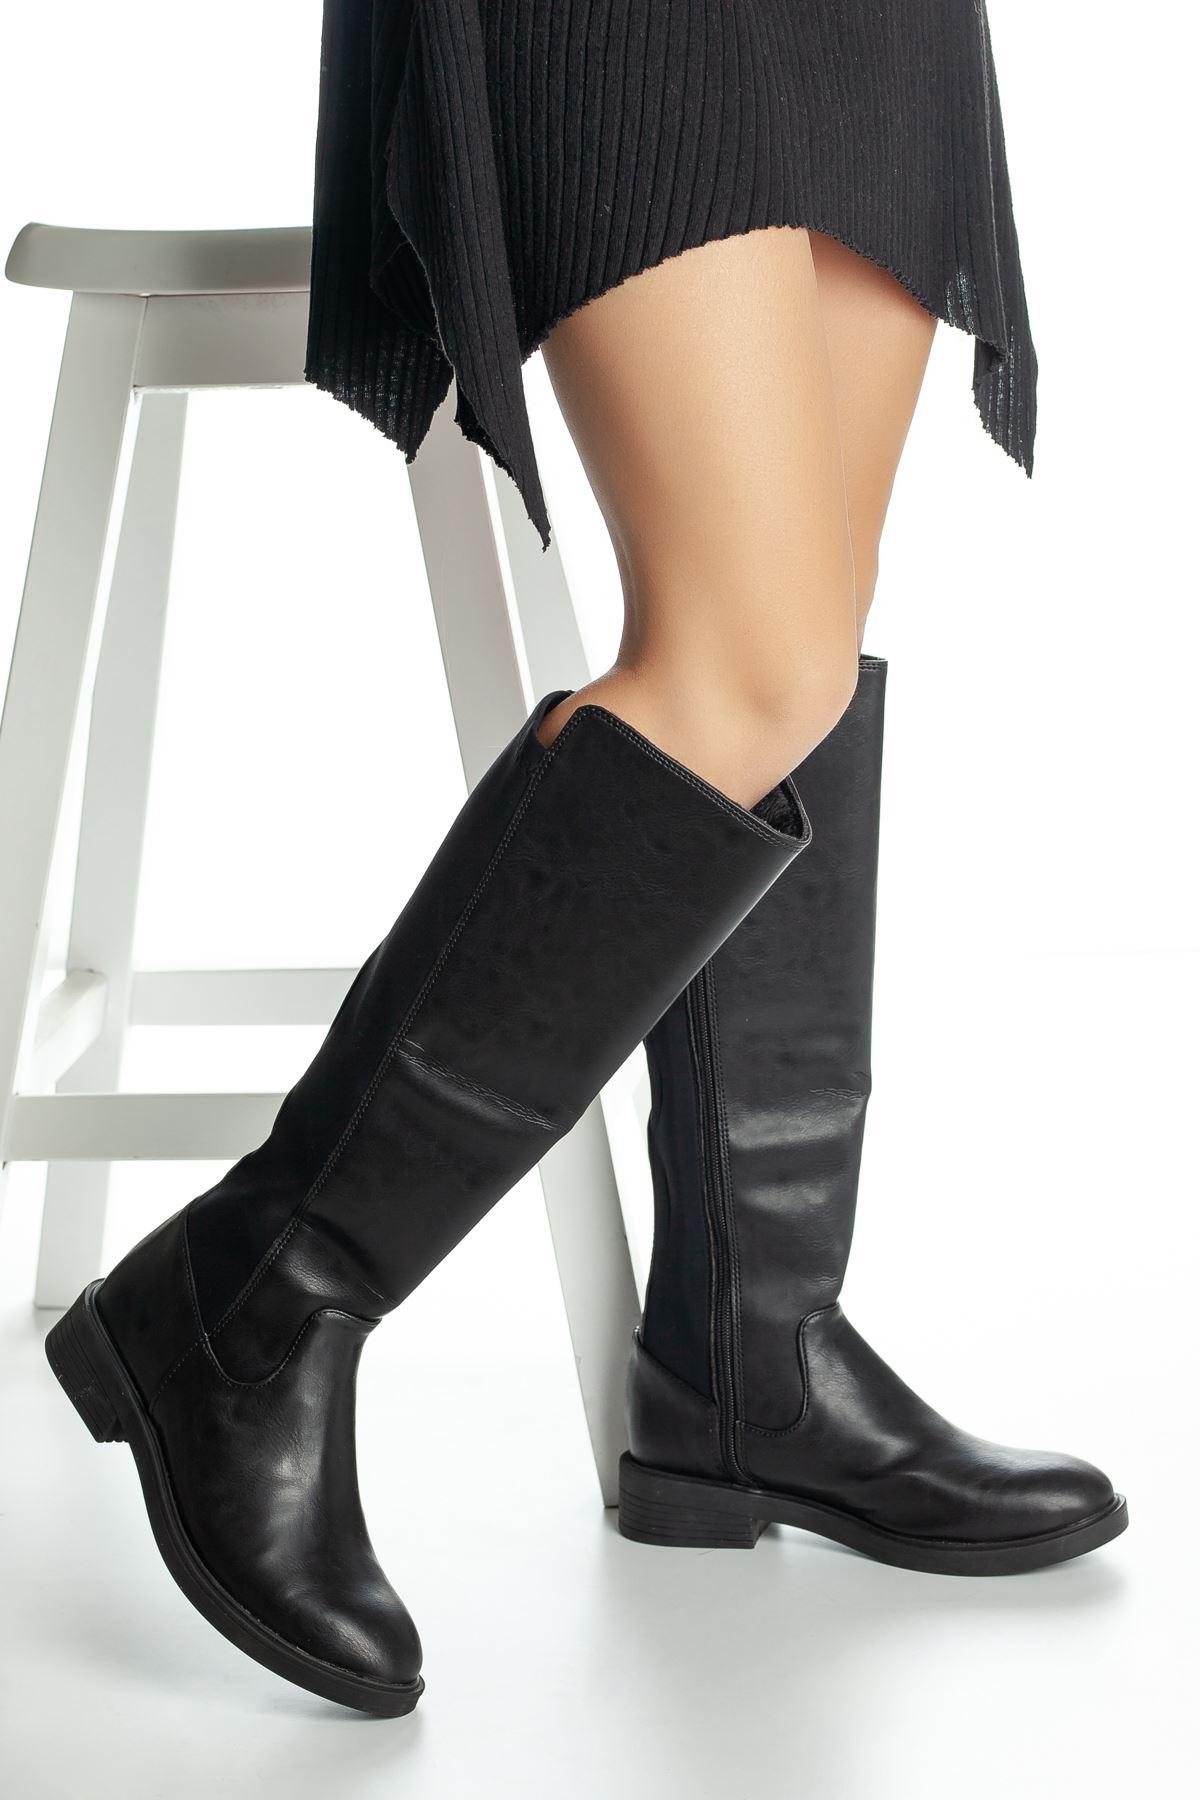 Vensis Cilt Çizme Siyah